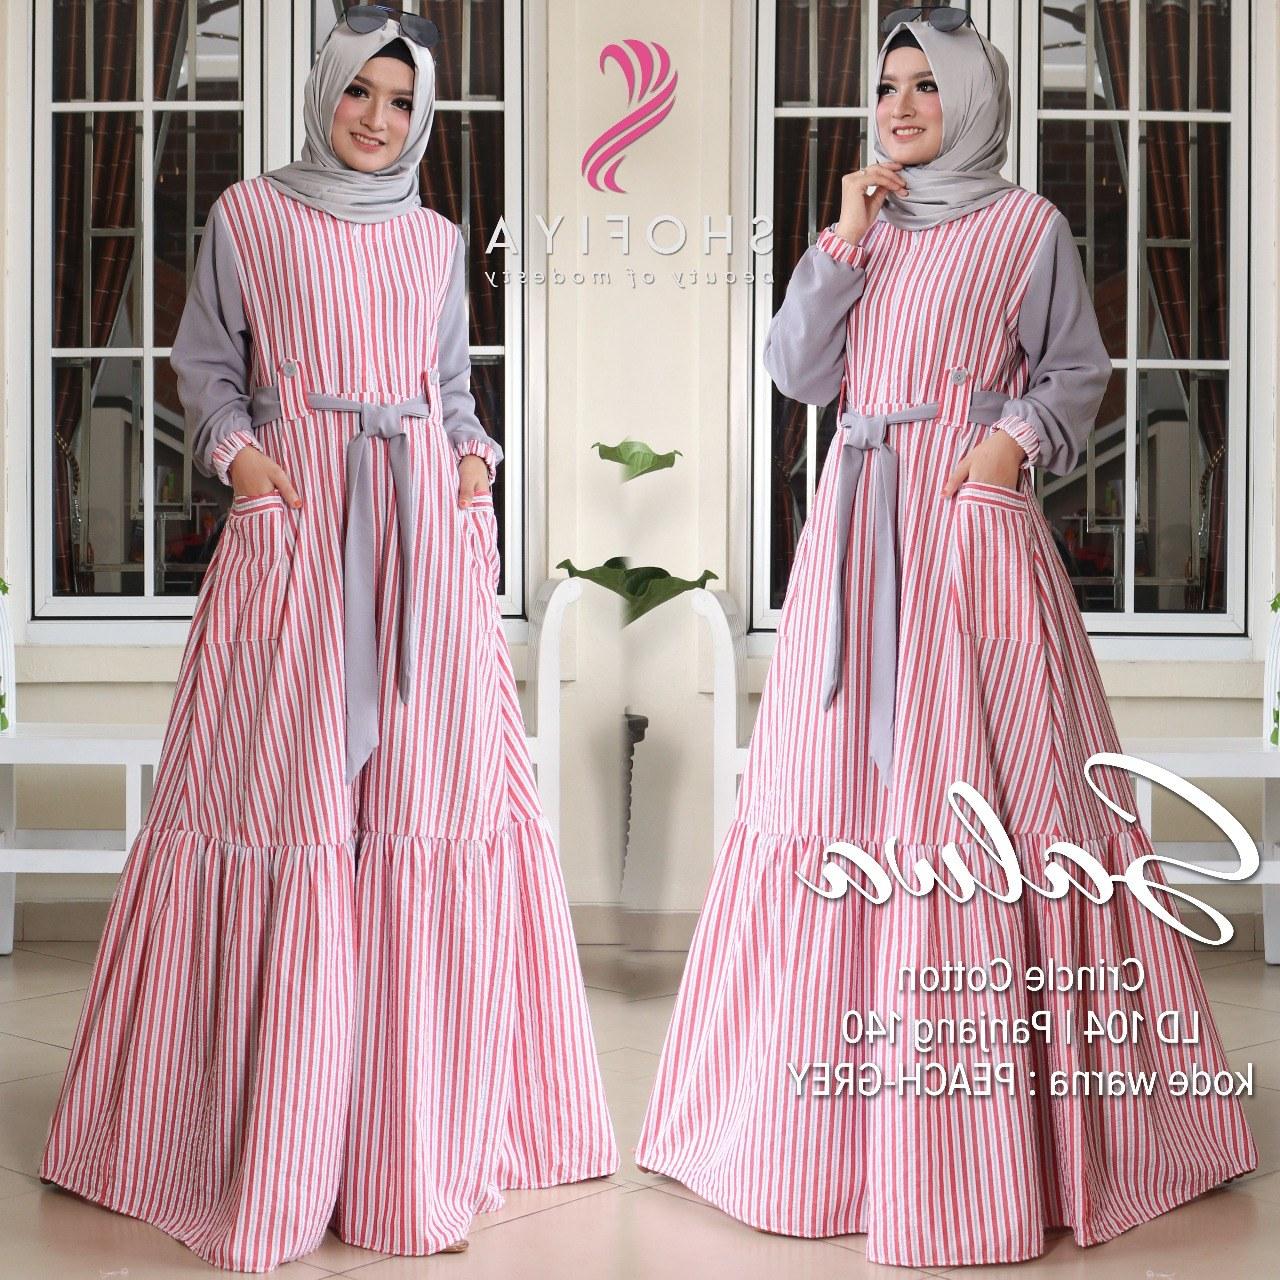 Design Model Baju Lebaran Terbaru Bqdd Model Baju Gamis Terbaru Lebaran Gambar islami